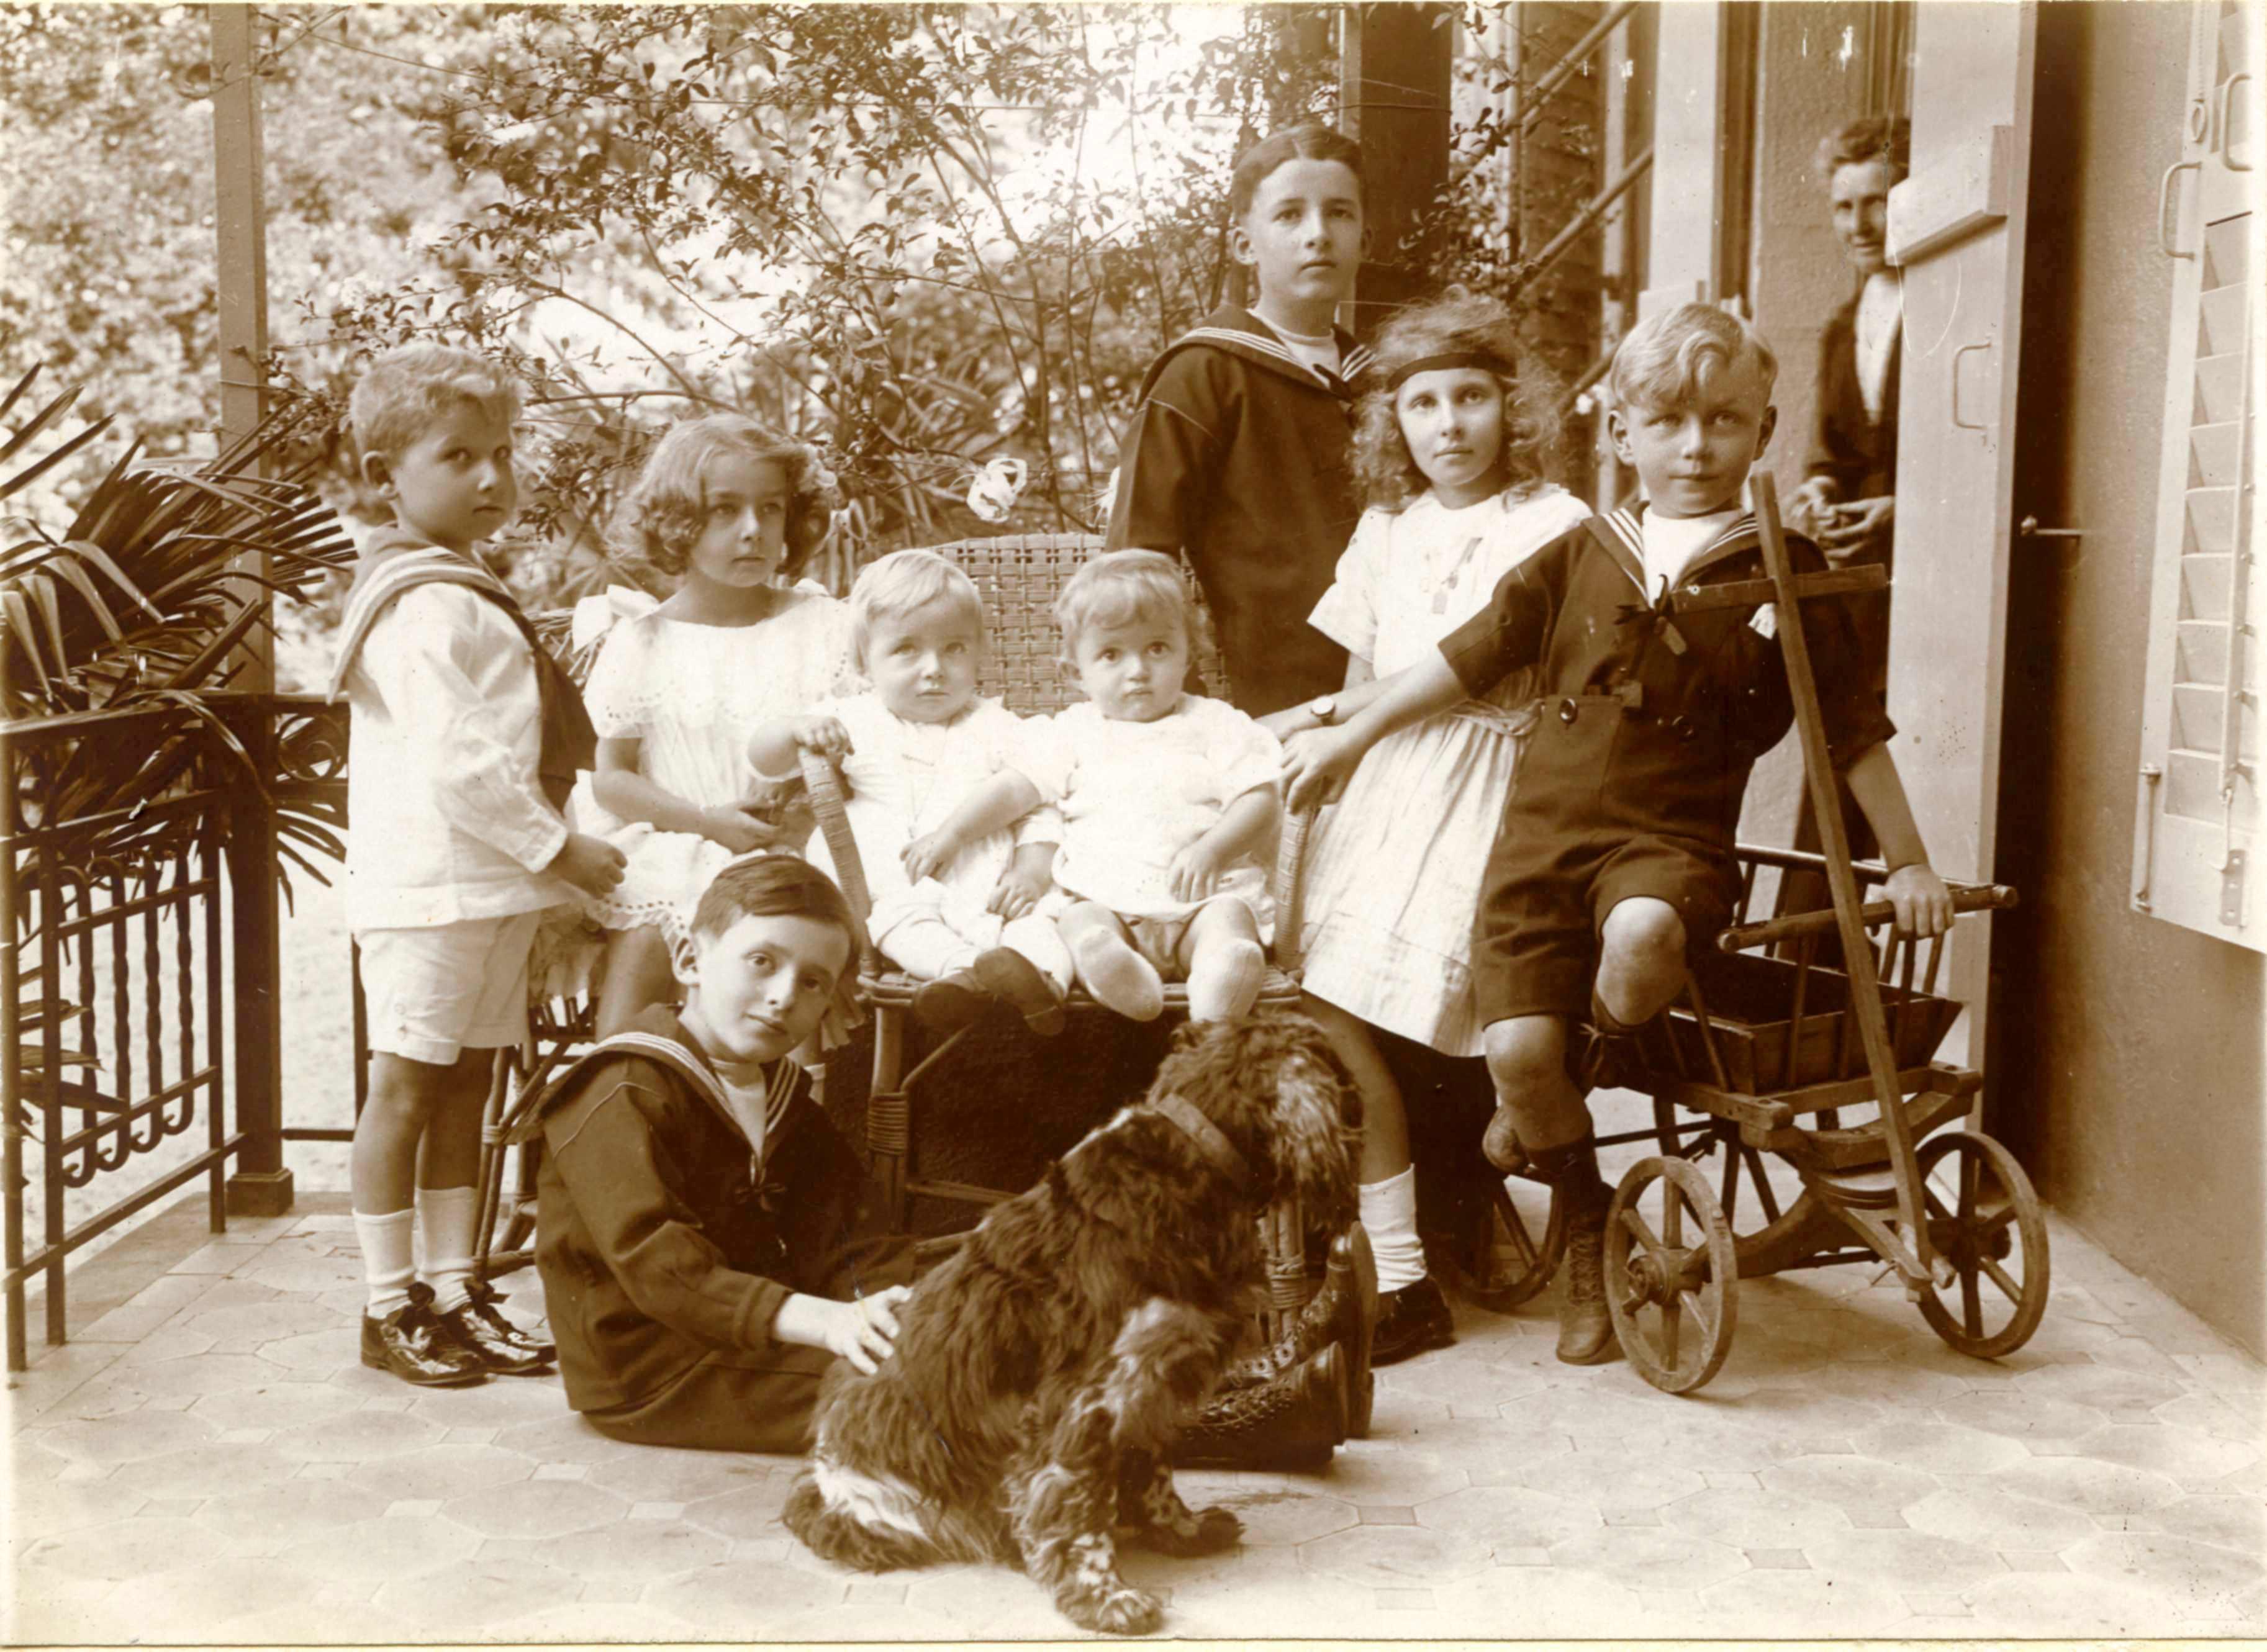 1919-5-Docelles-Enfants a prendre Corrigee.jpg